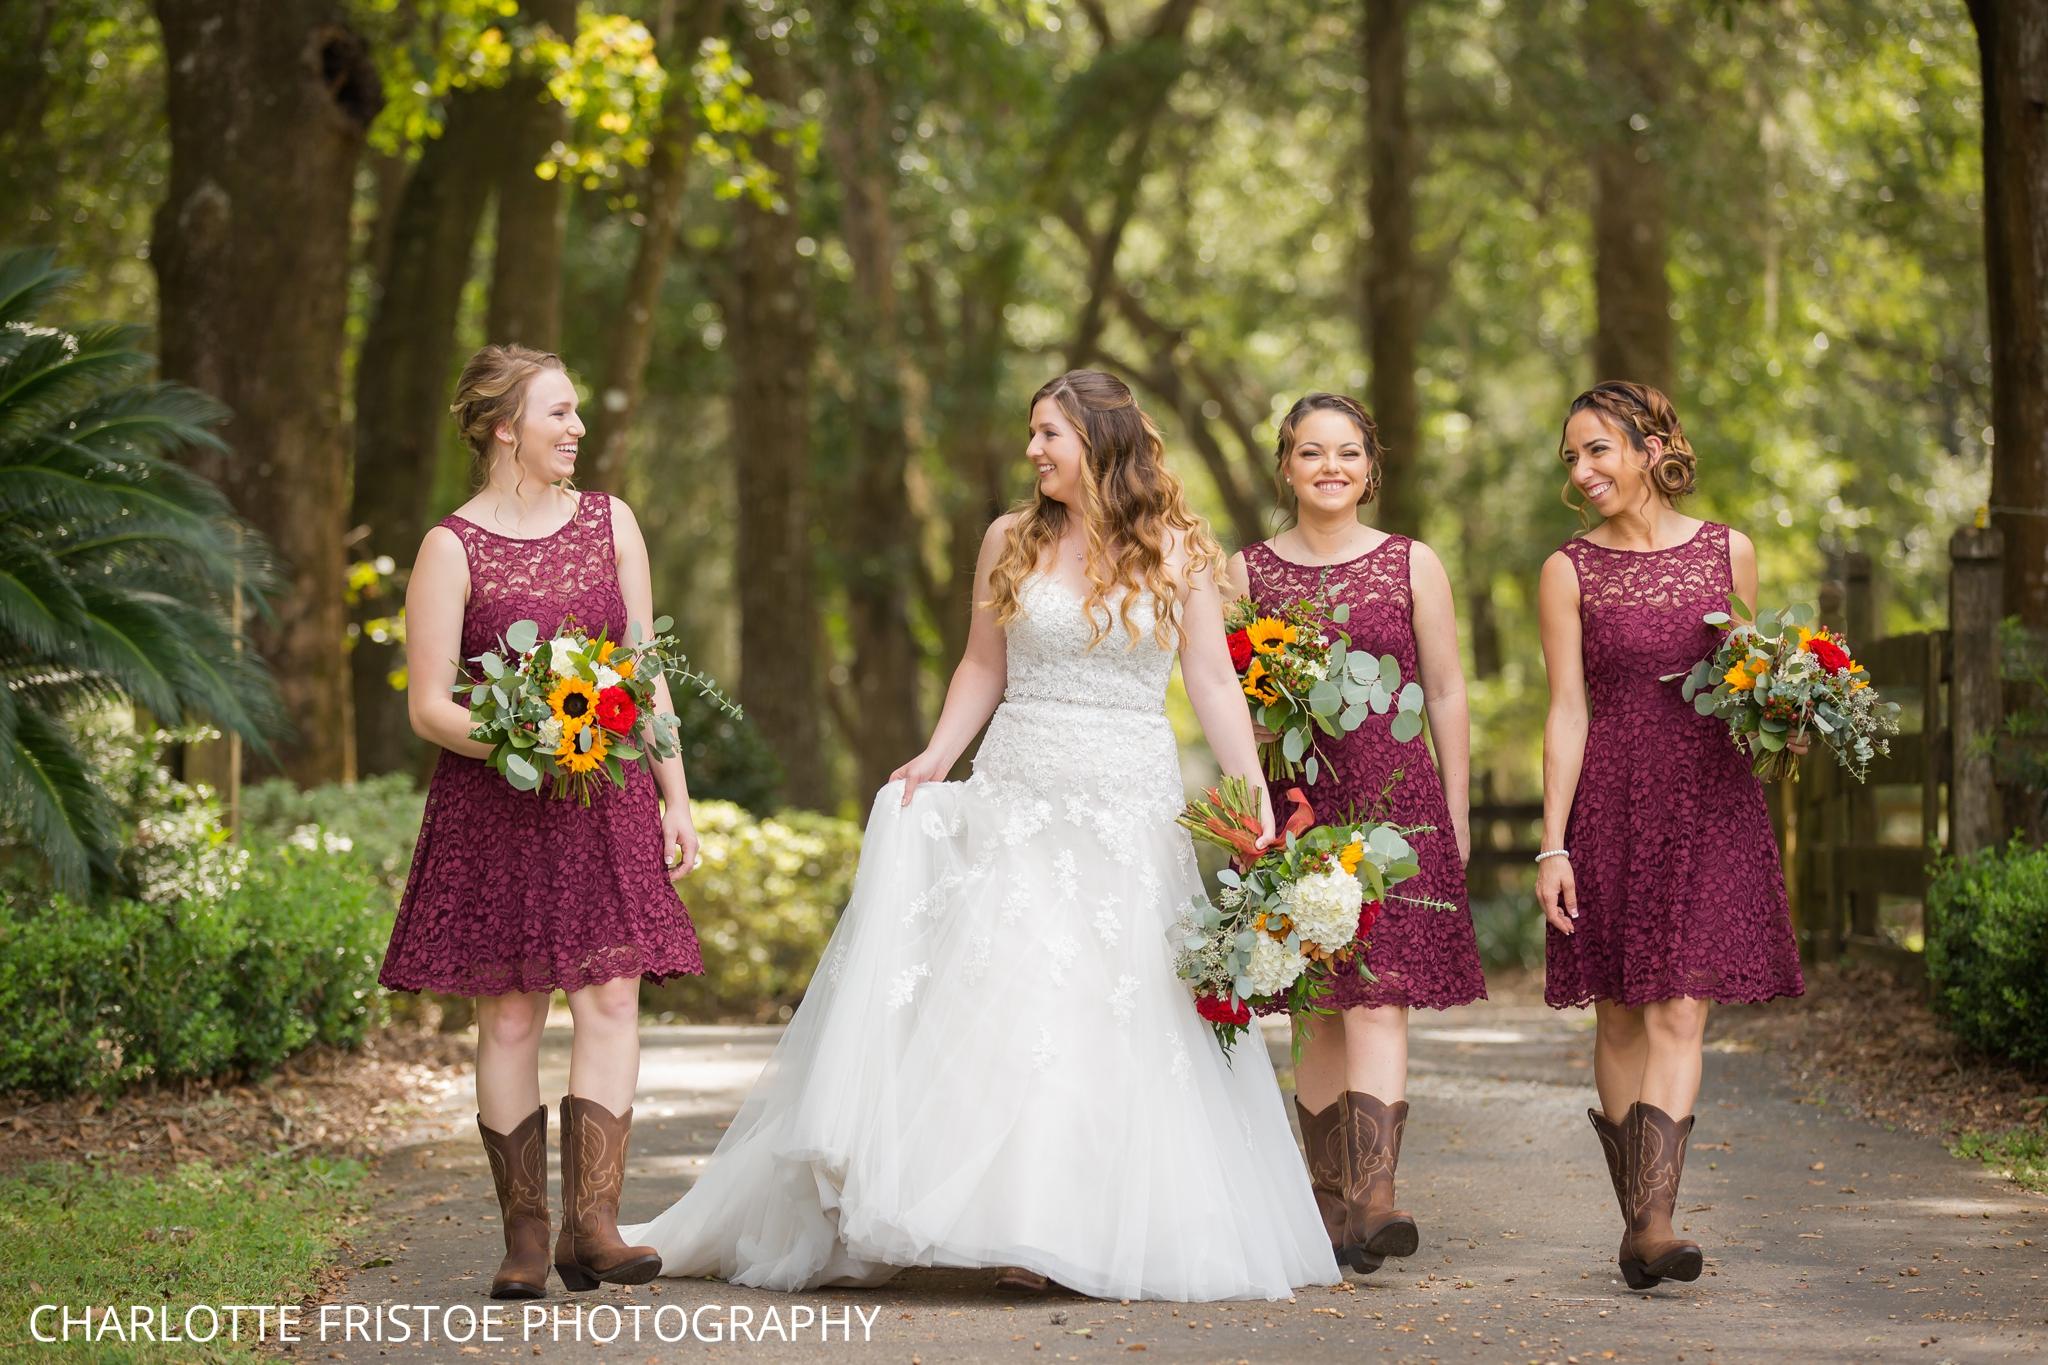 Tallahassee_Wedding_Charlotte_Fristoe-13.jpg